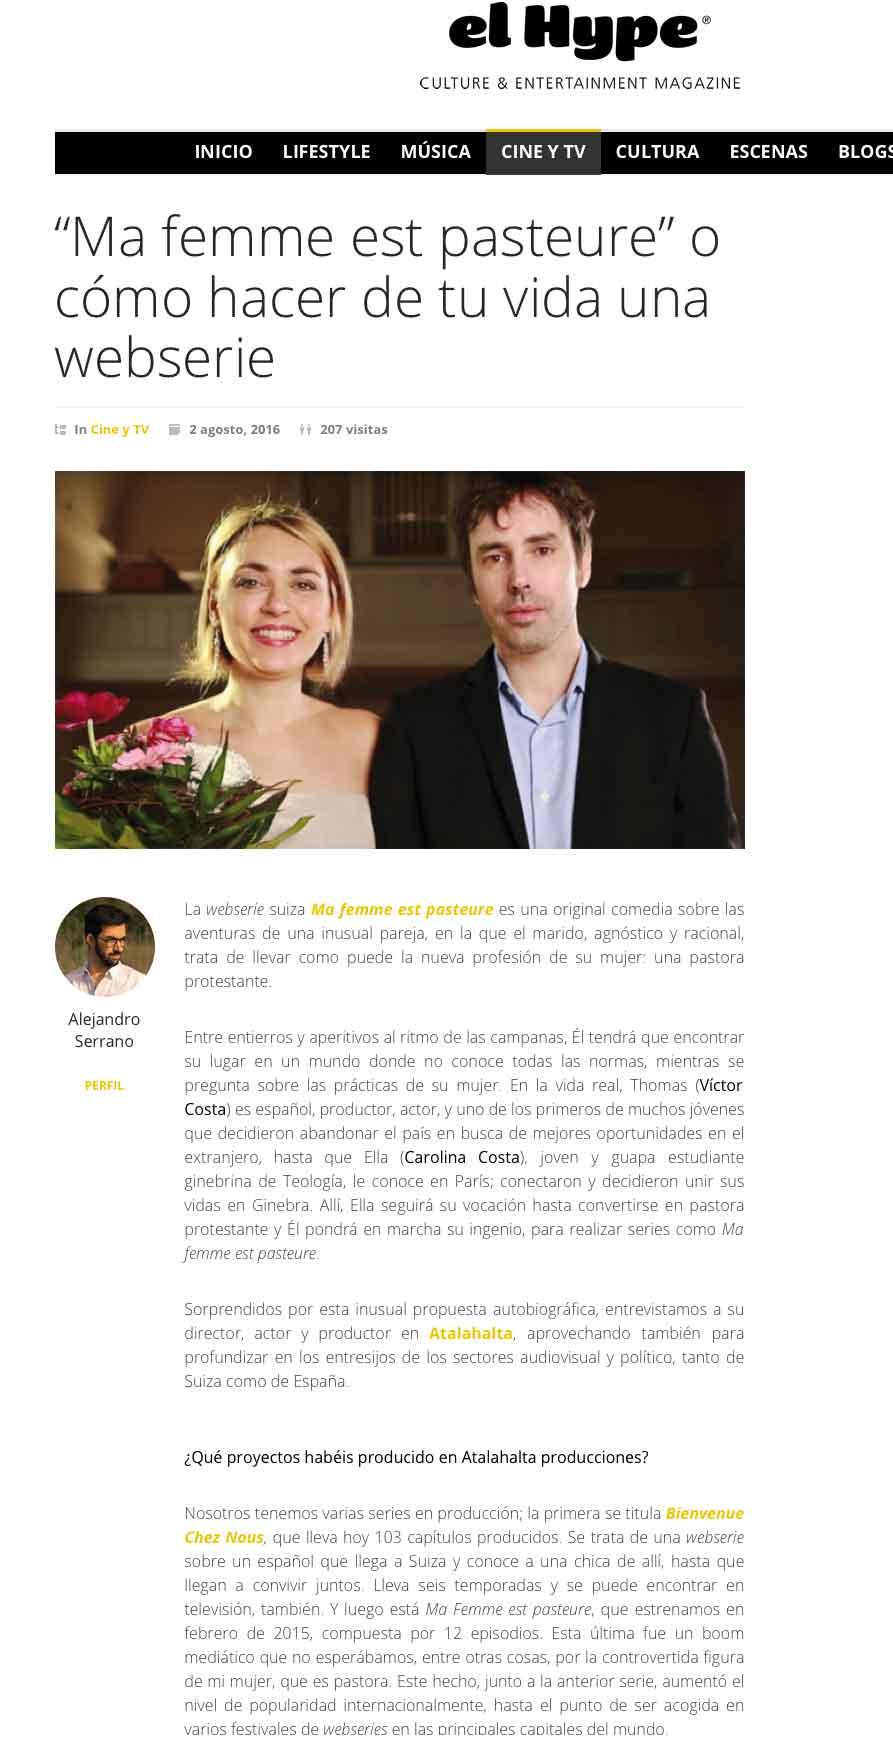 El Hype du 02 août 2016 - Espagne